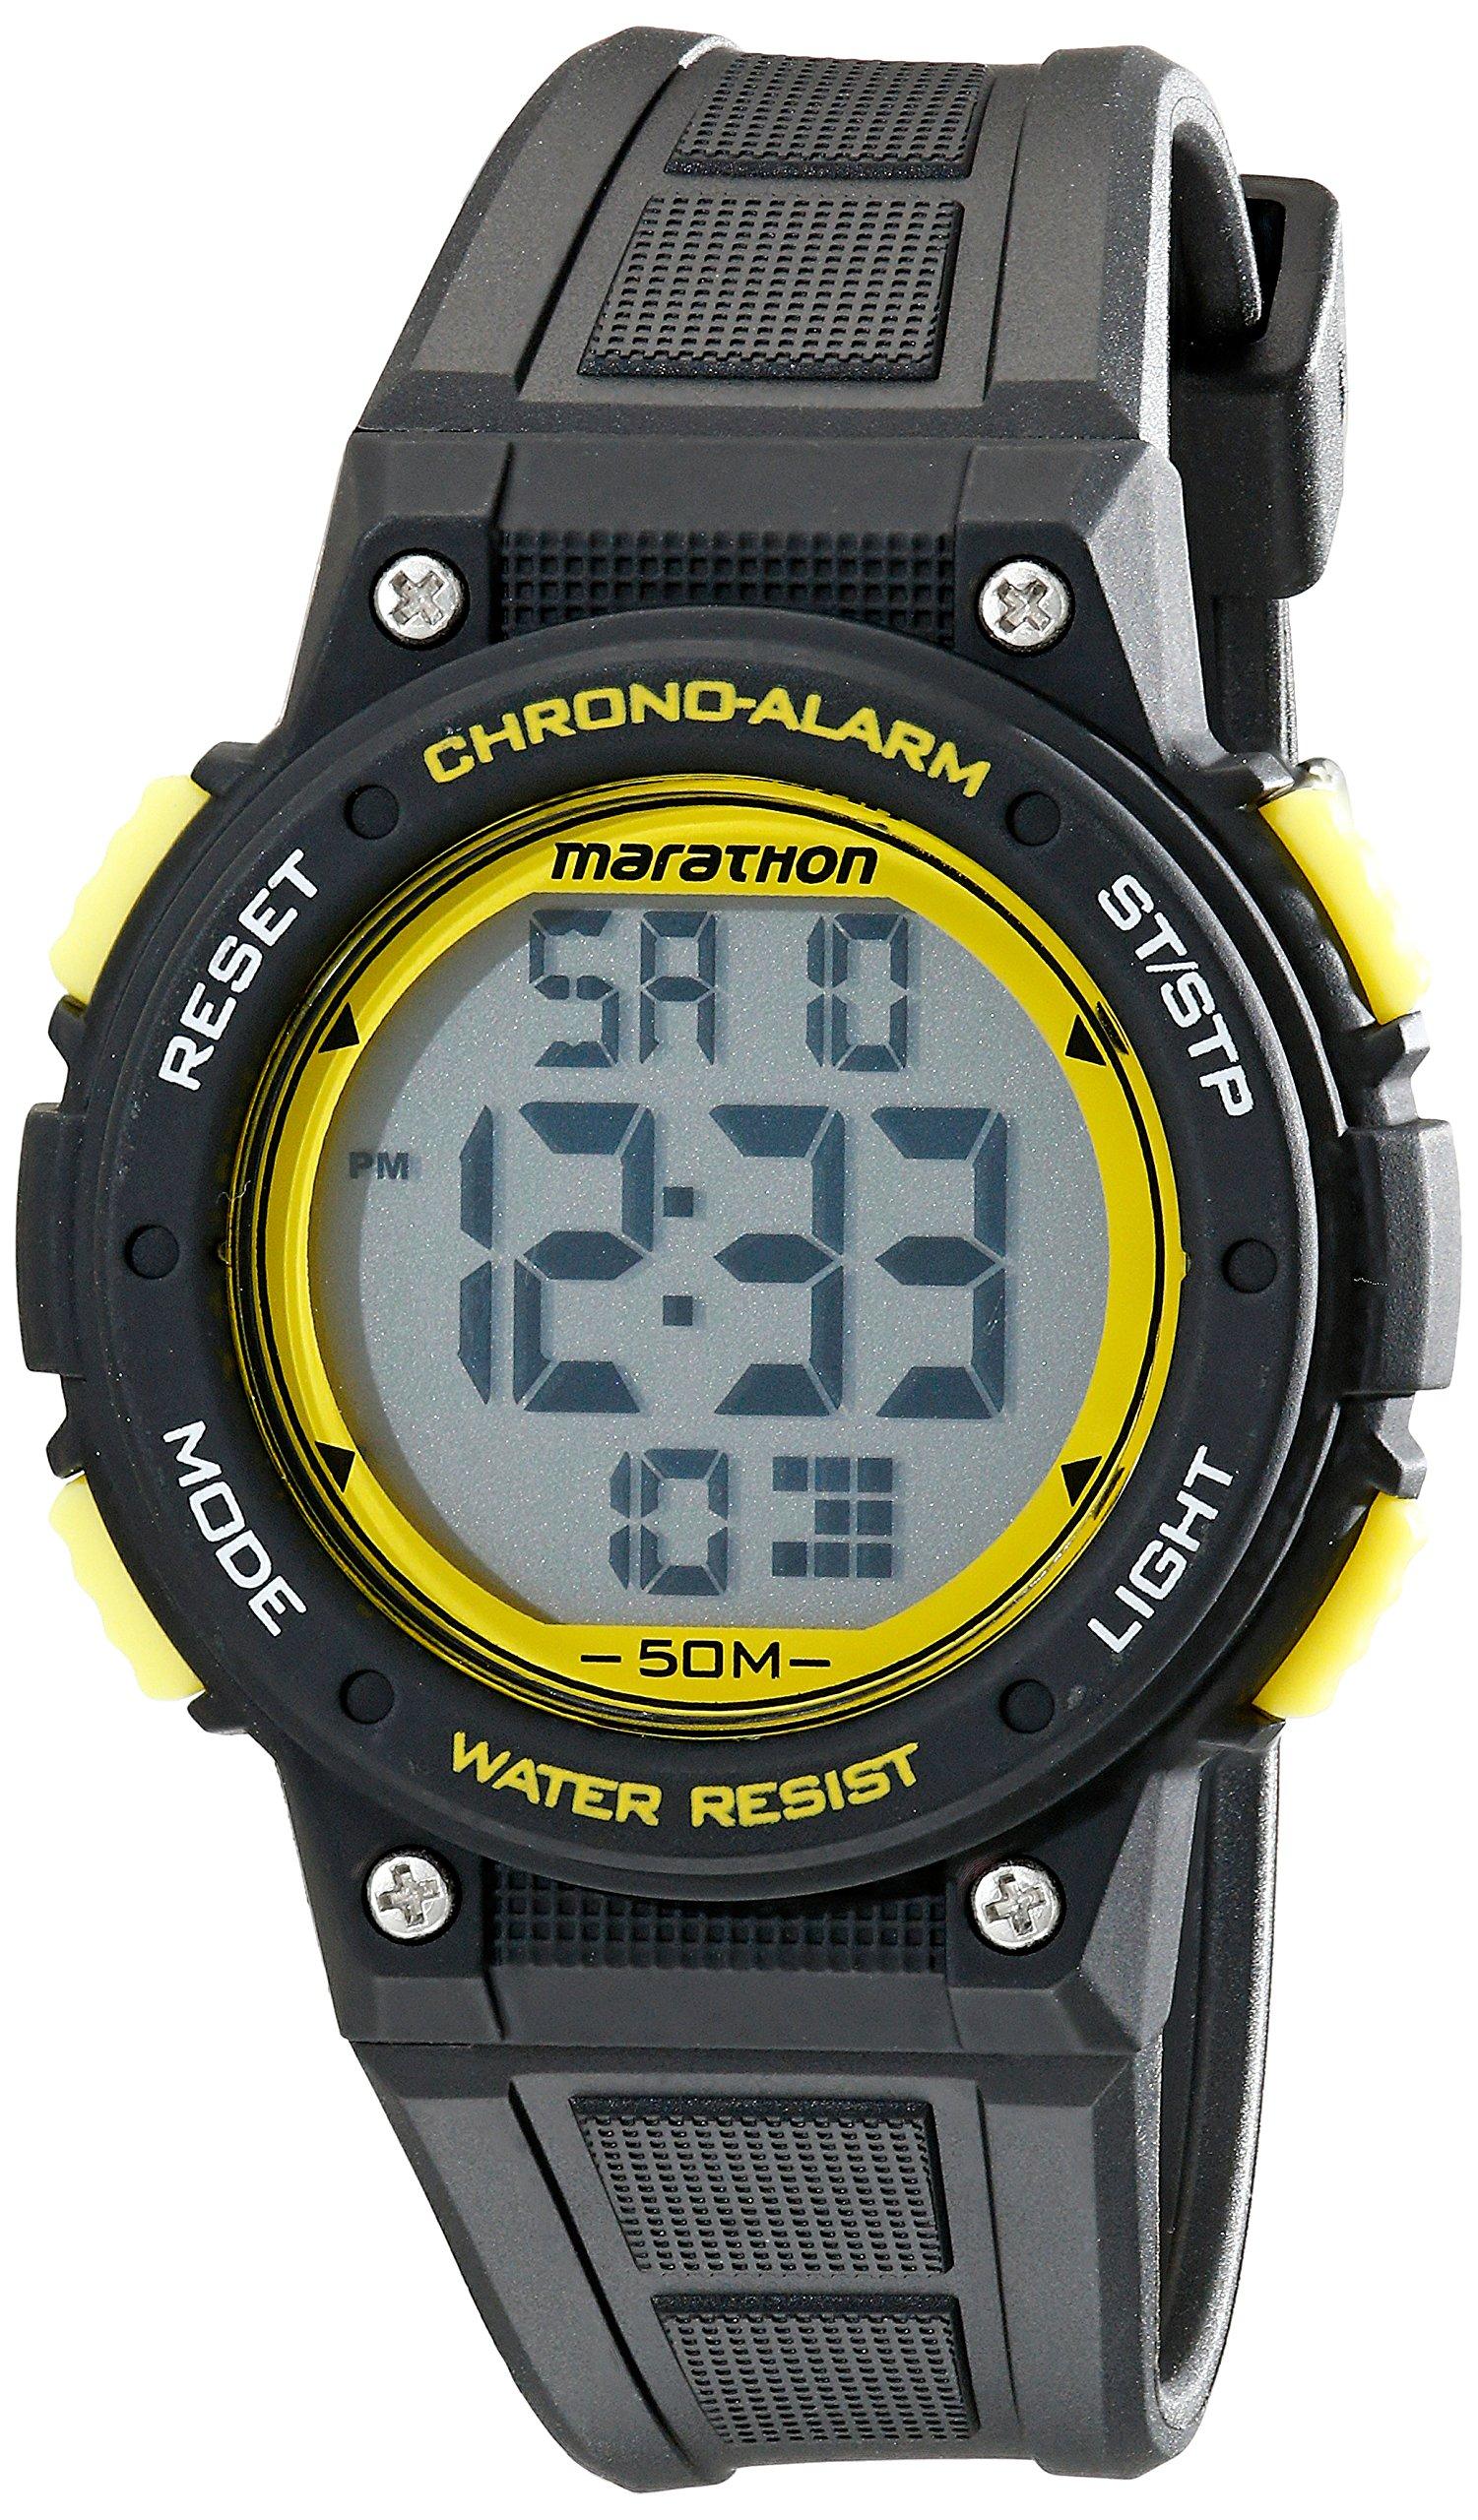 Timex Unisex TW5K84900 Marathon Digital Watch with Black Band by Timex